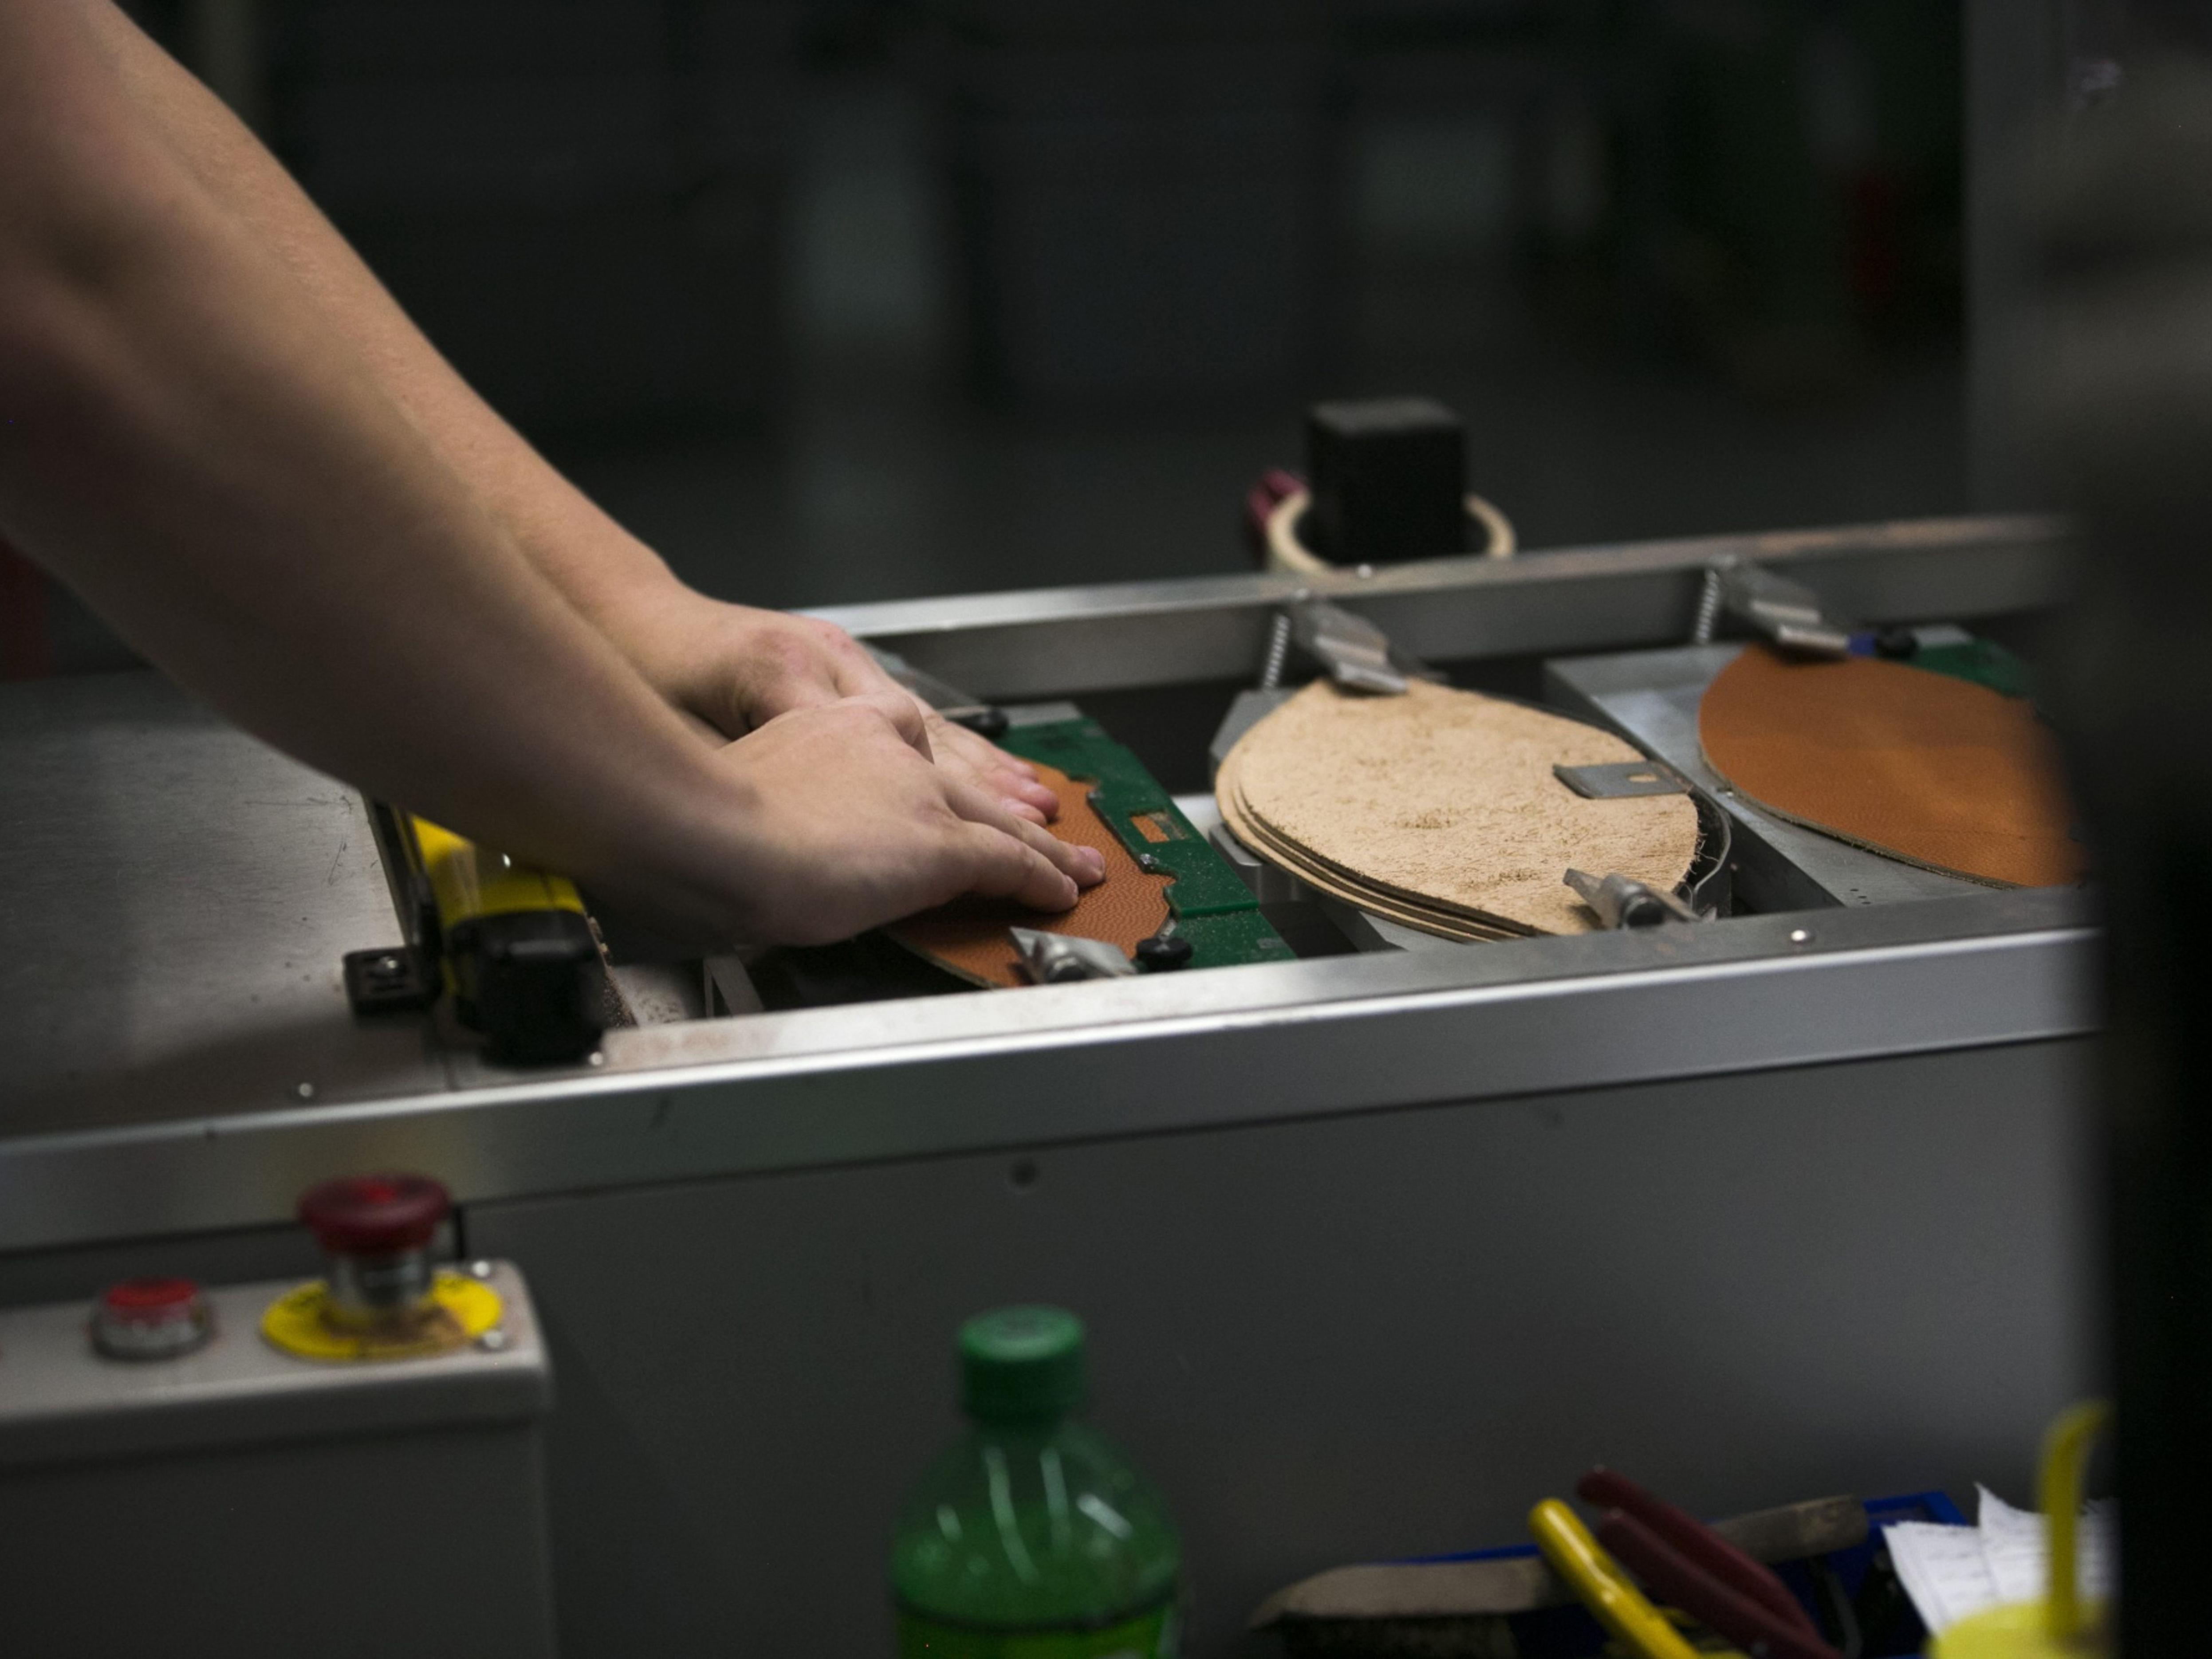 U.S. Manufacturing Gauge Pulls Back on Slower Orders, Production